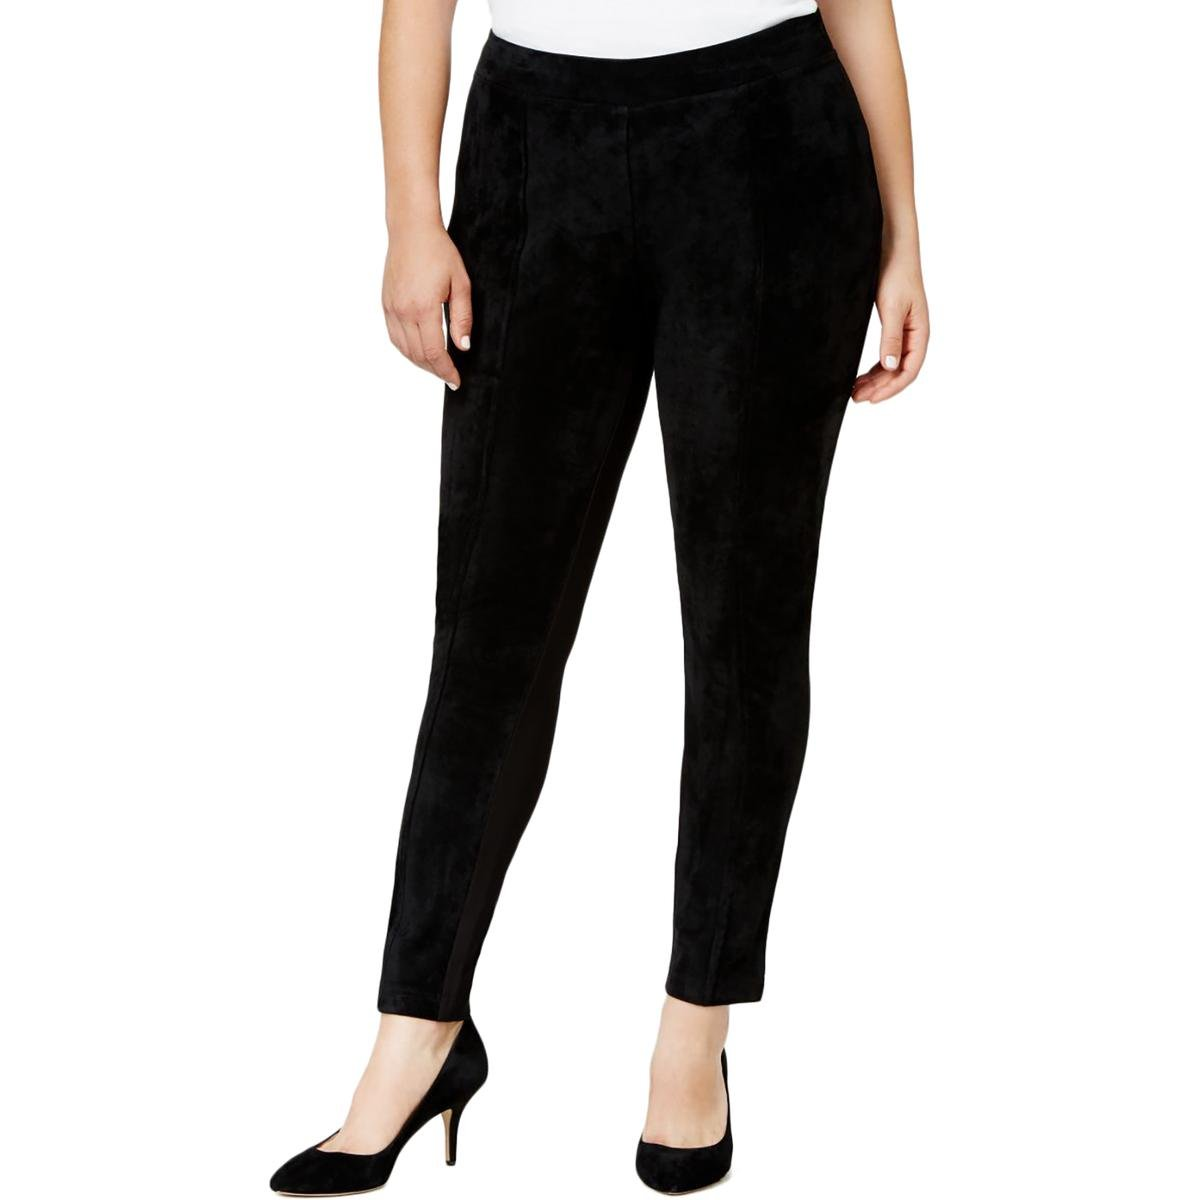 Calvin Klein Women's Plus-Size Essential Power Stretch Faux-Suede Front Legging, Black, 2X